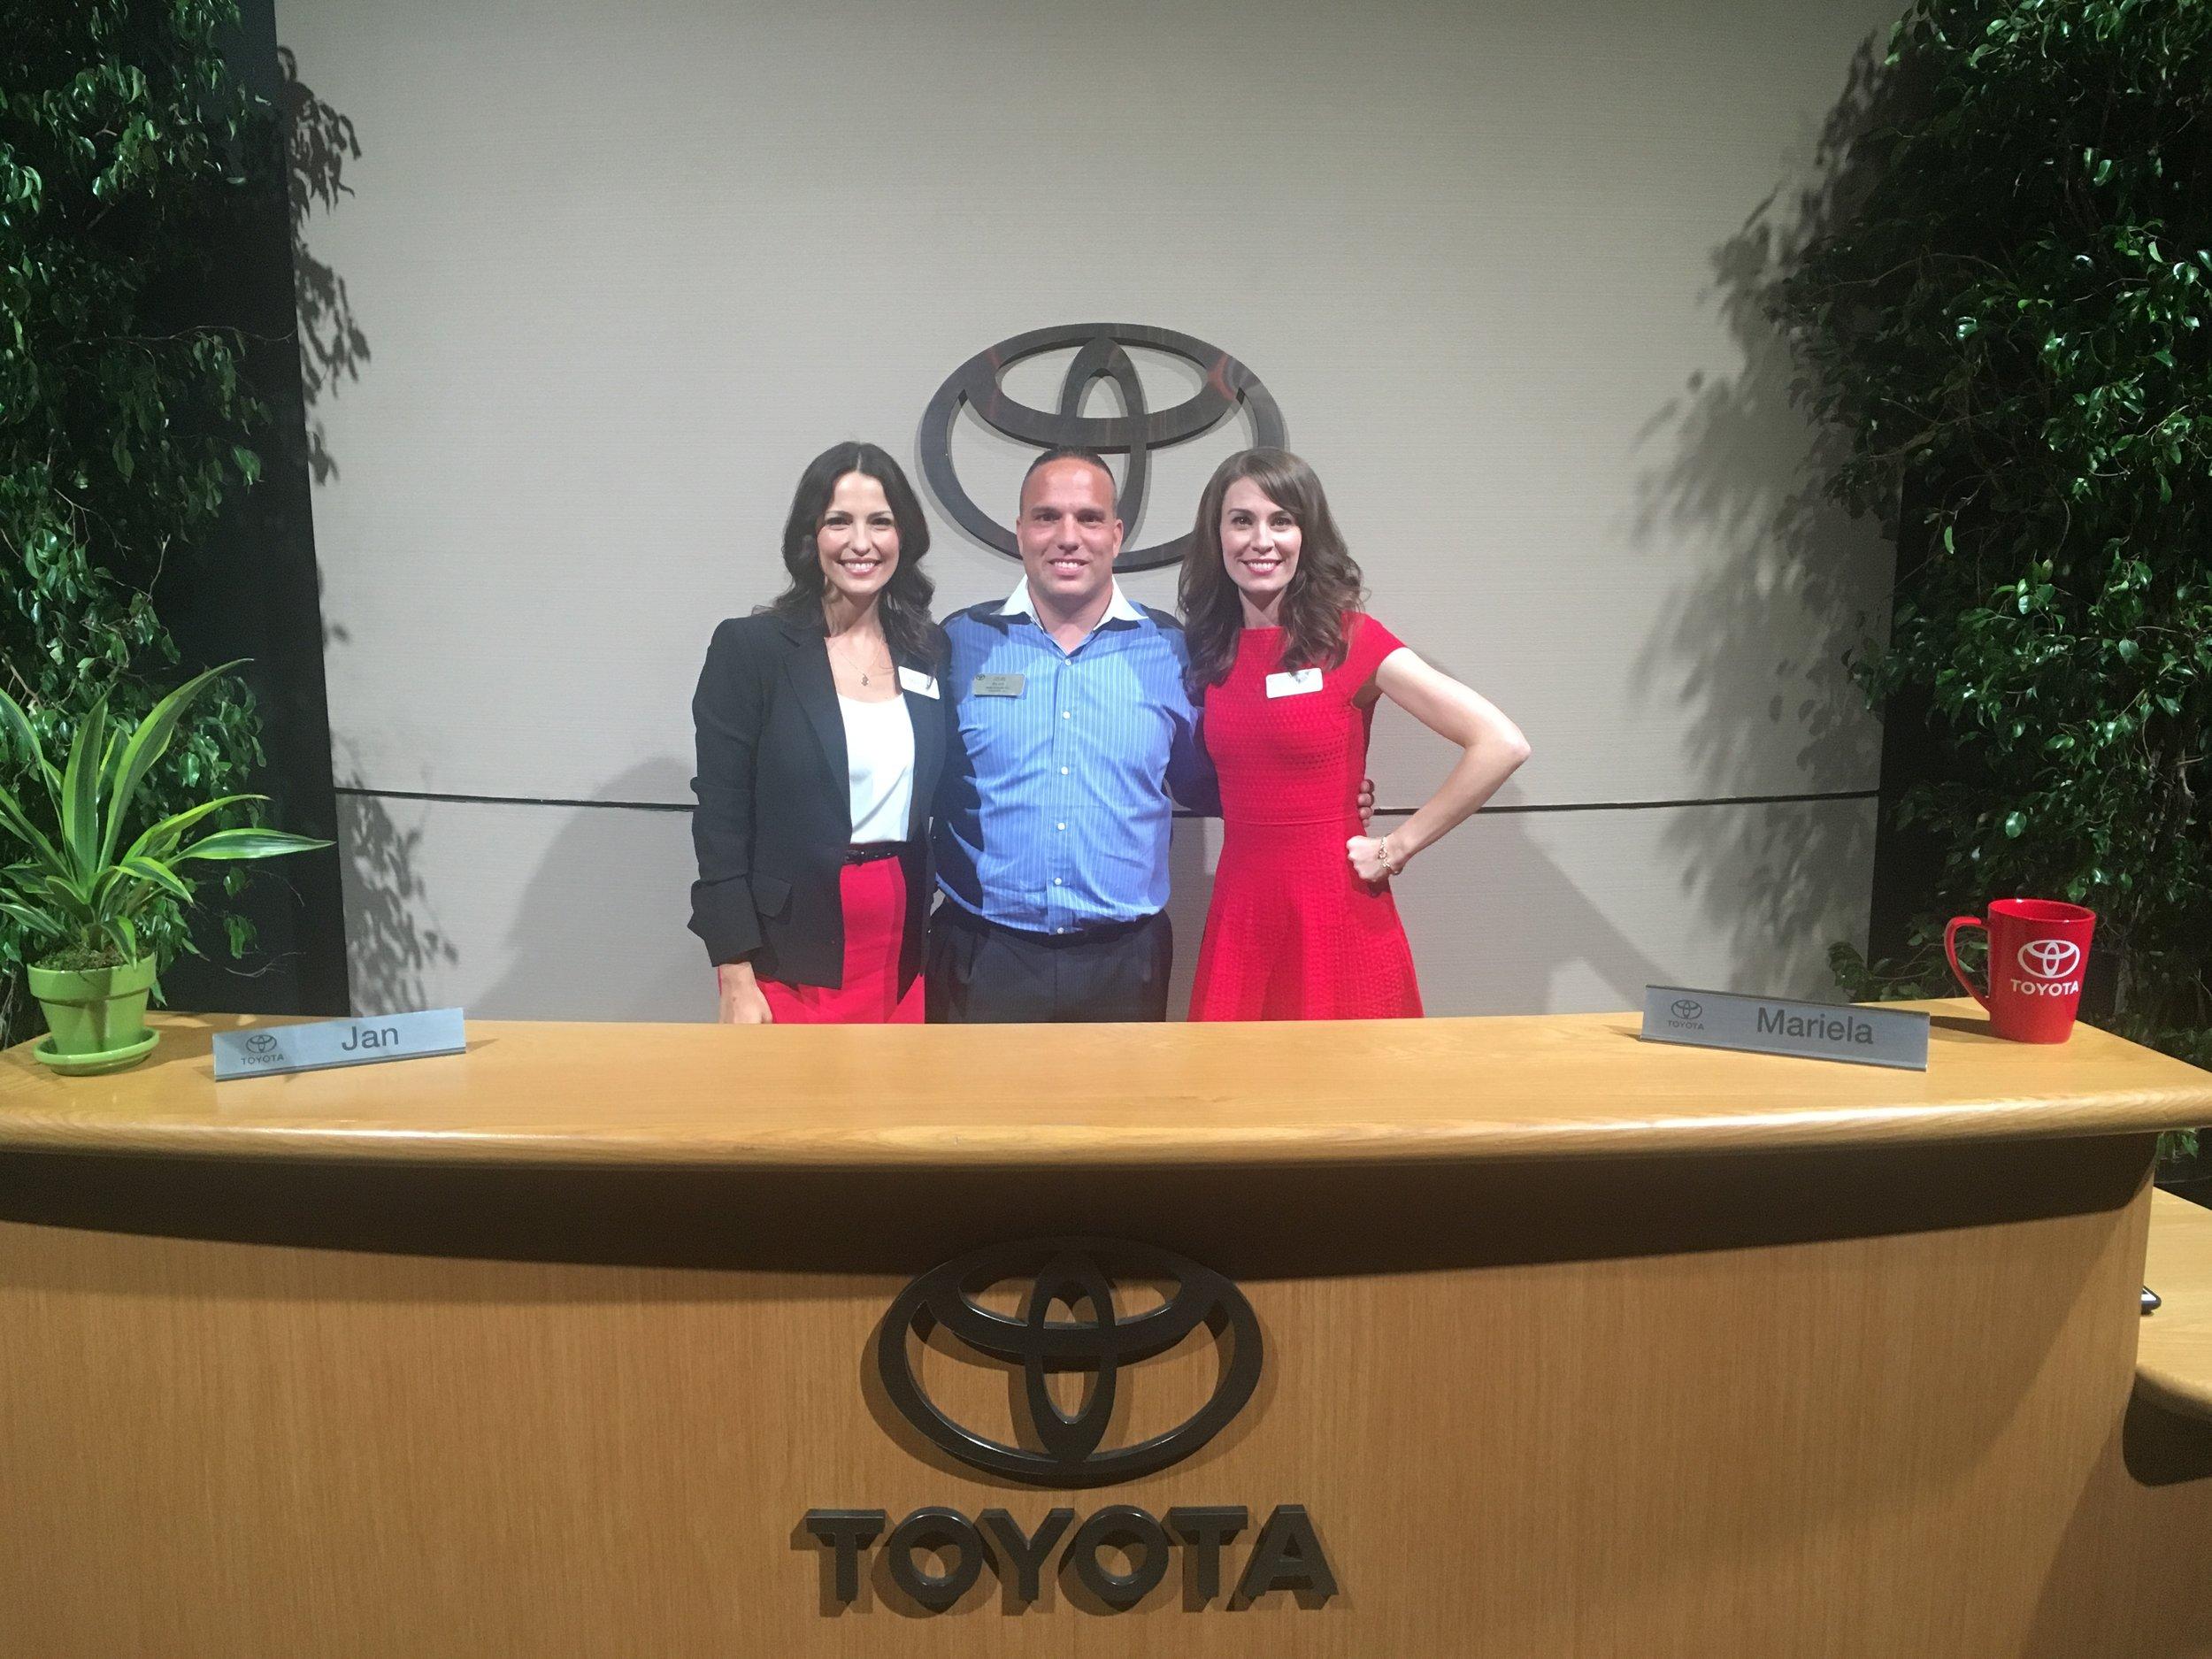 Louis Rylant with Jan Toyota Spokeswoman.JPG